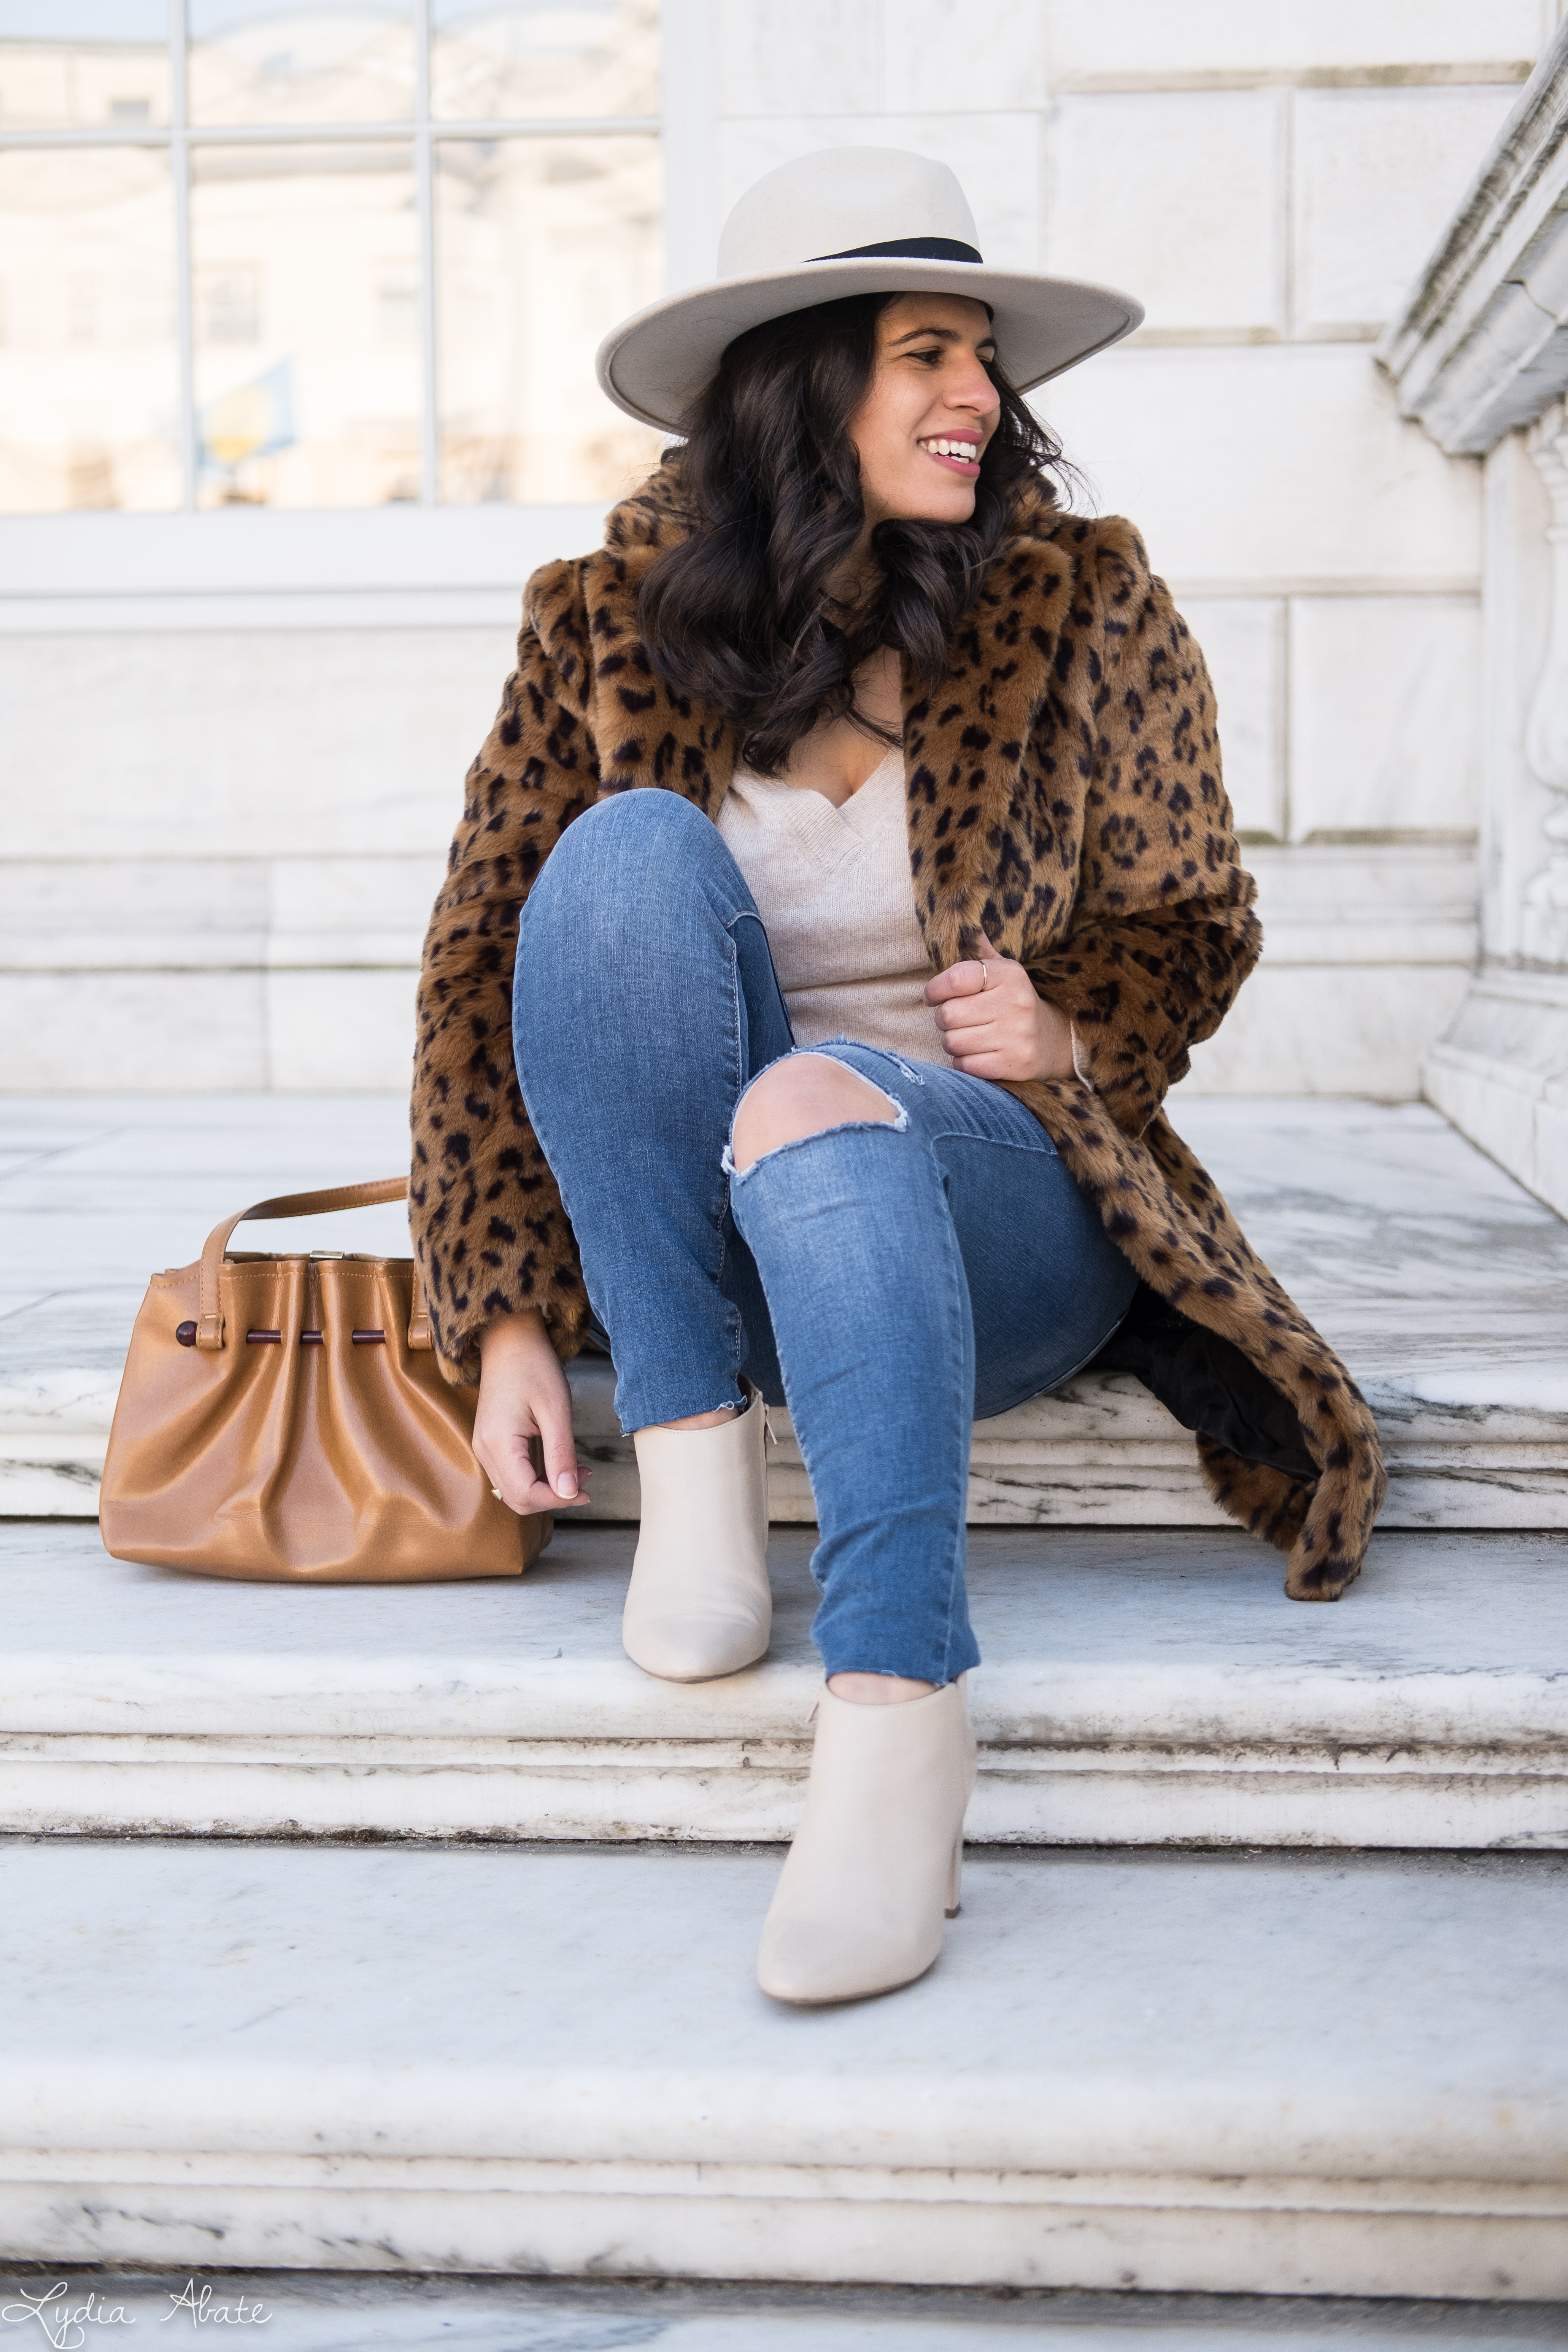 leopard fur coat, cashmere sweater, vintage bag, cream fedora, booties-13.jpg